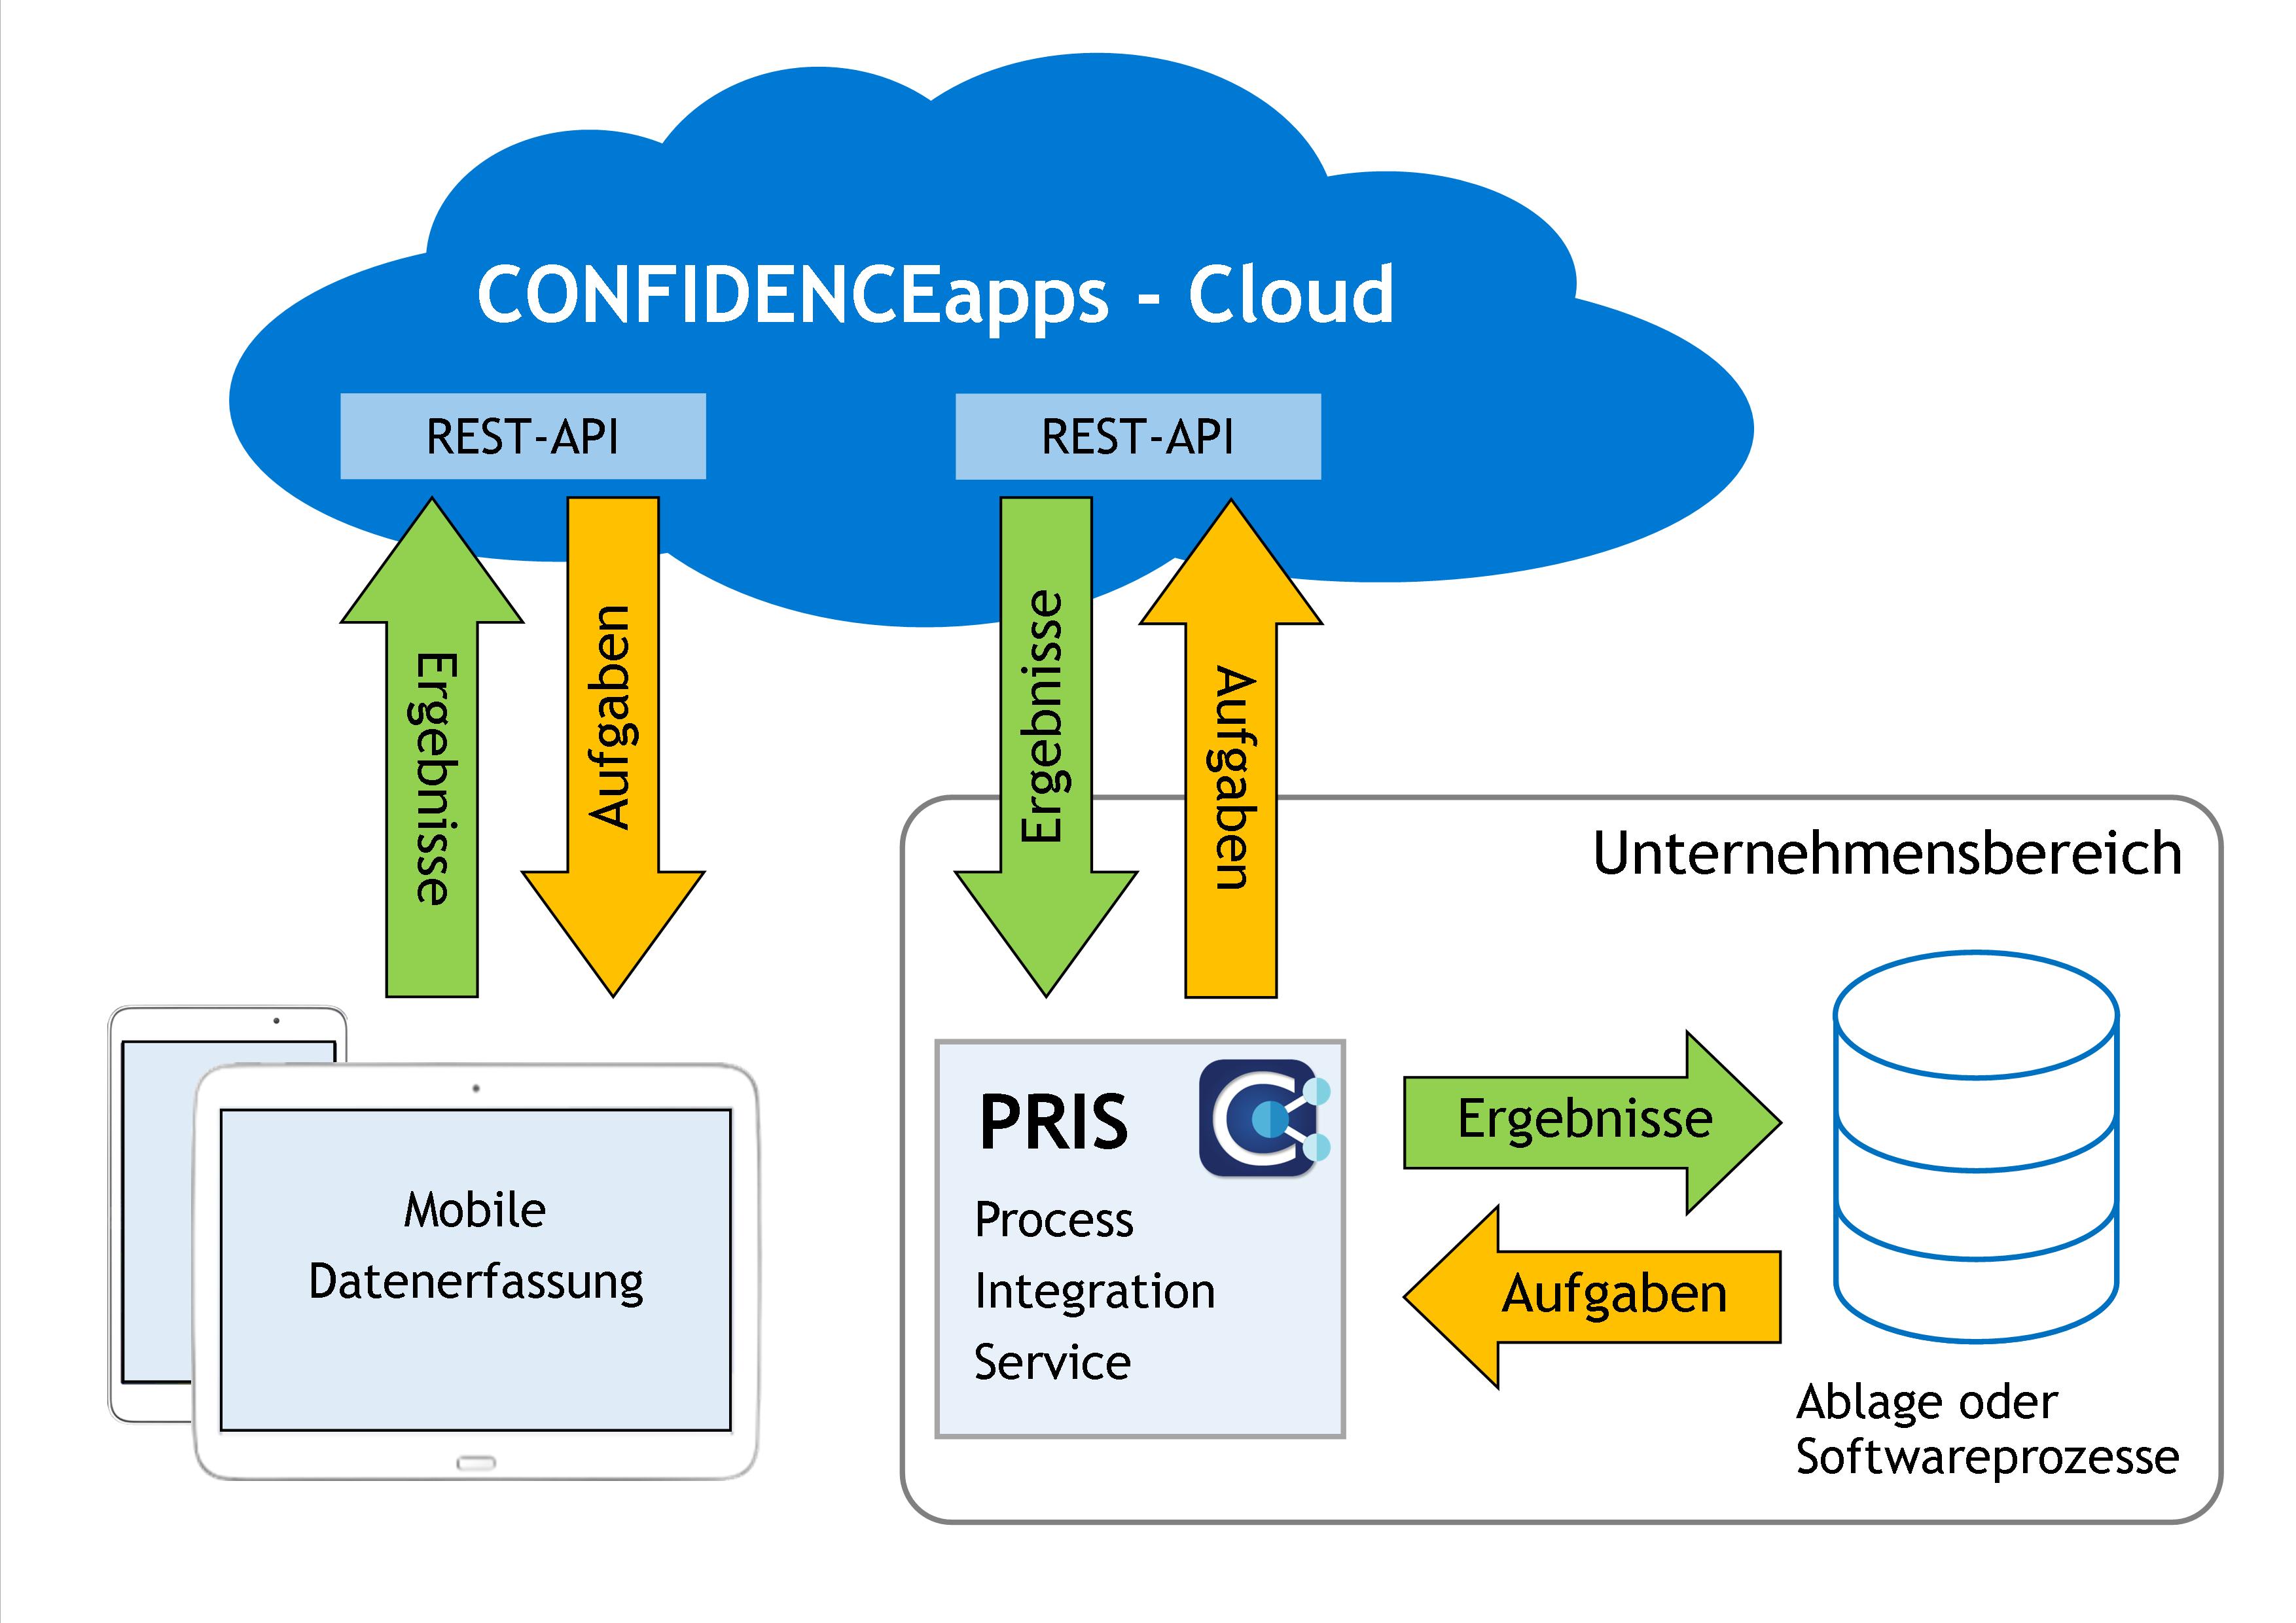 So integrieren wir App-Daten mit dem Dienst PRIS in Datenbanken